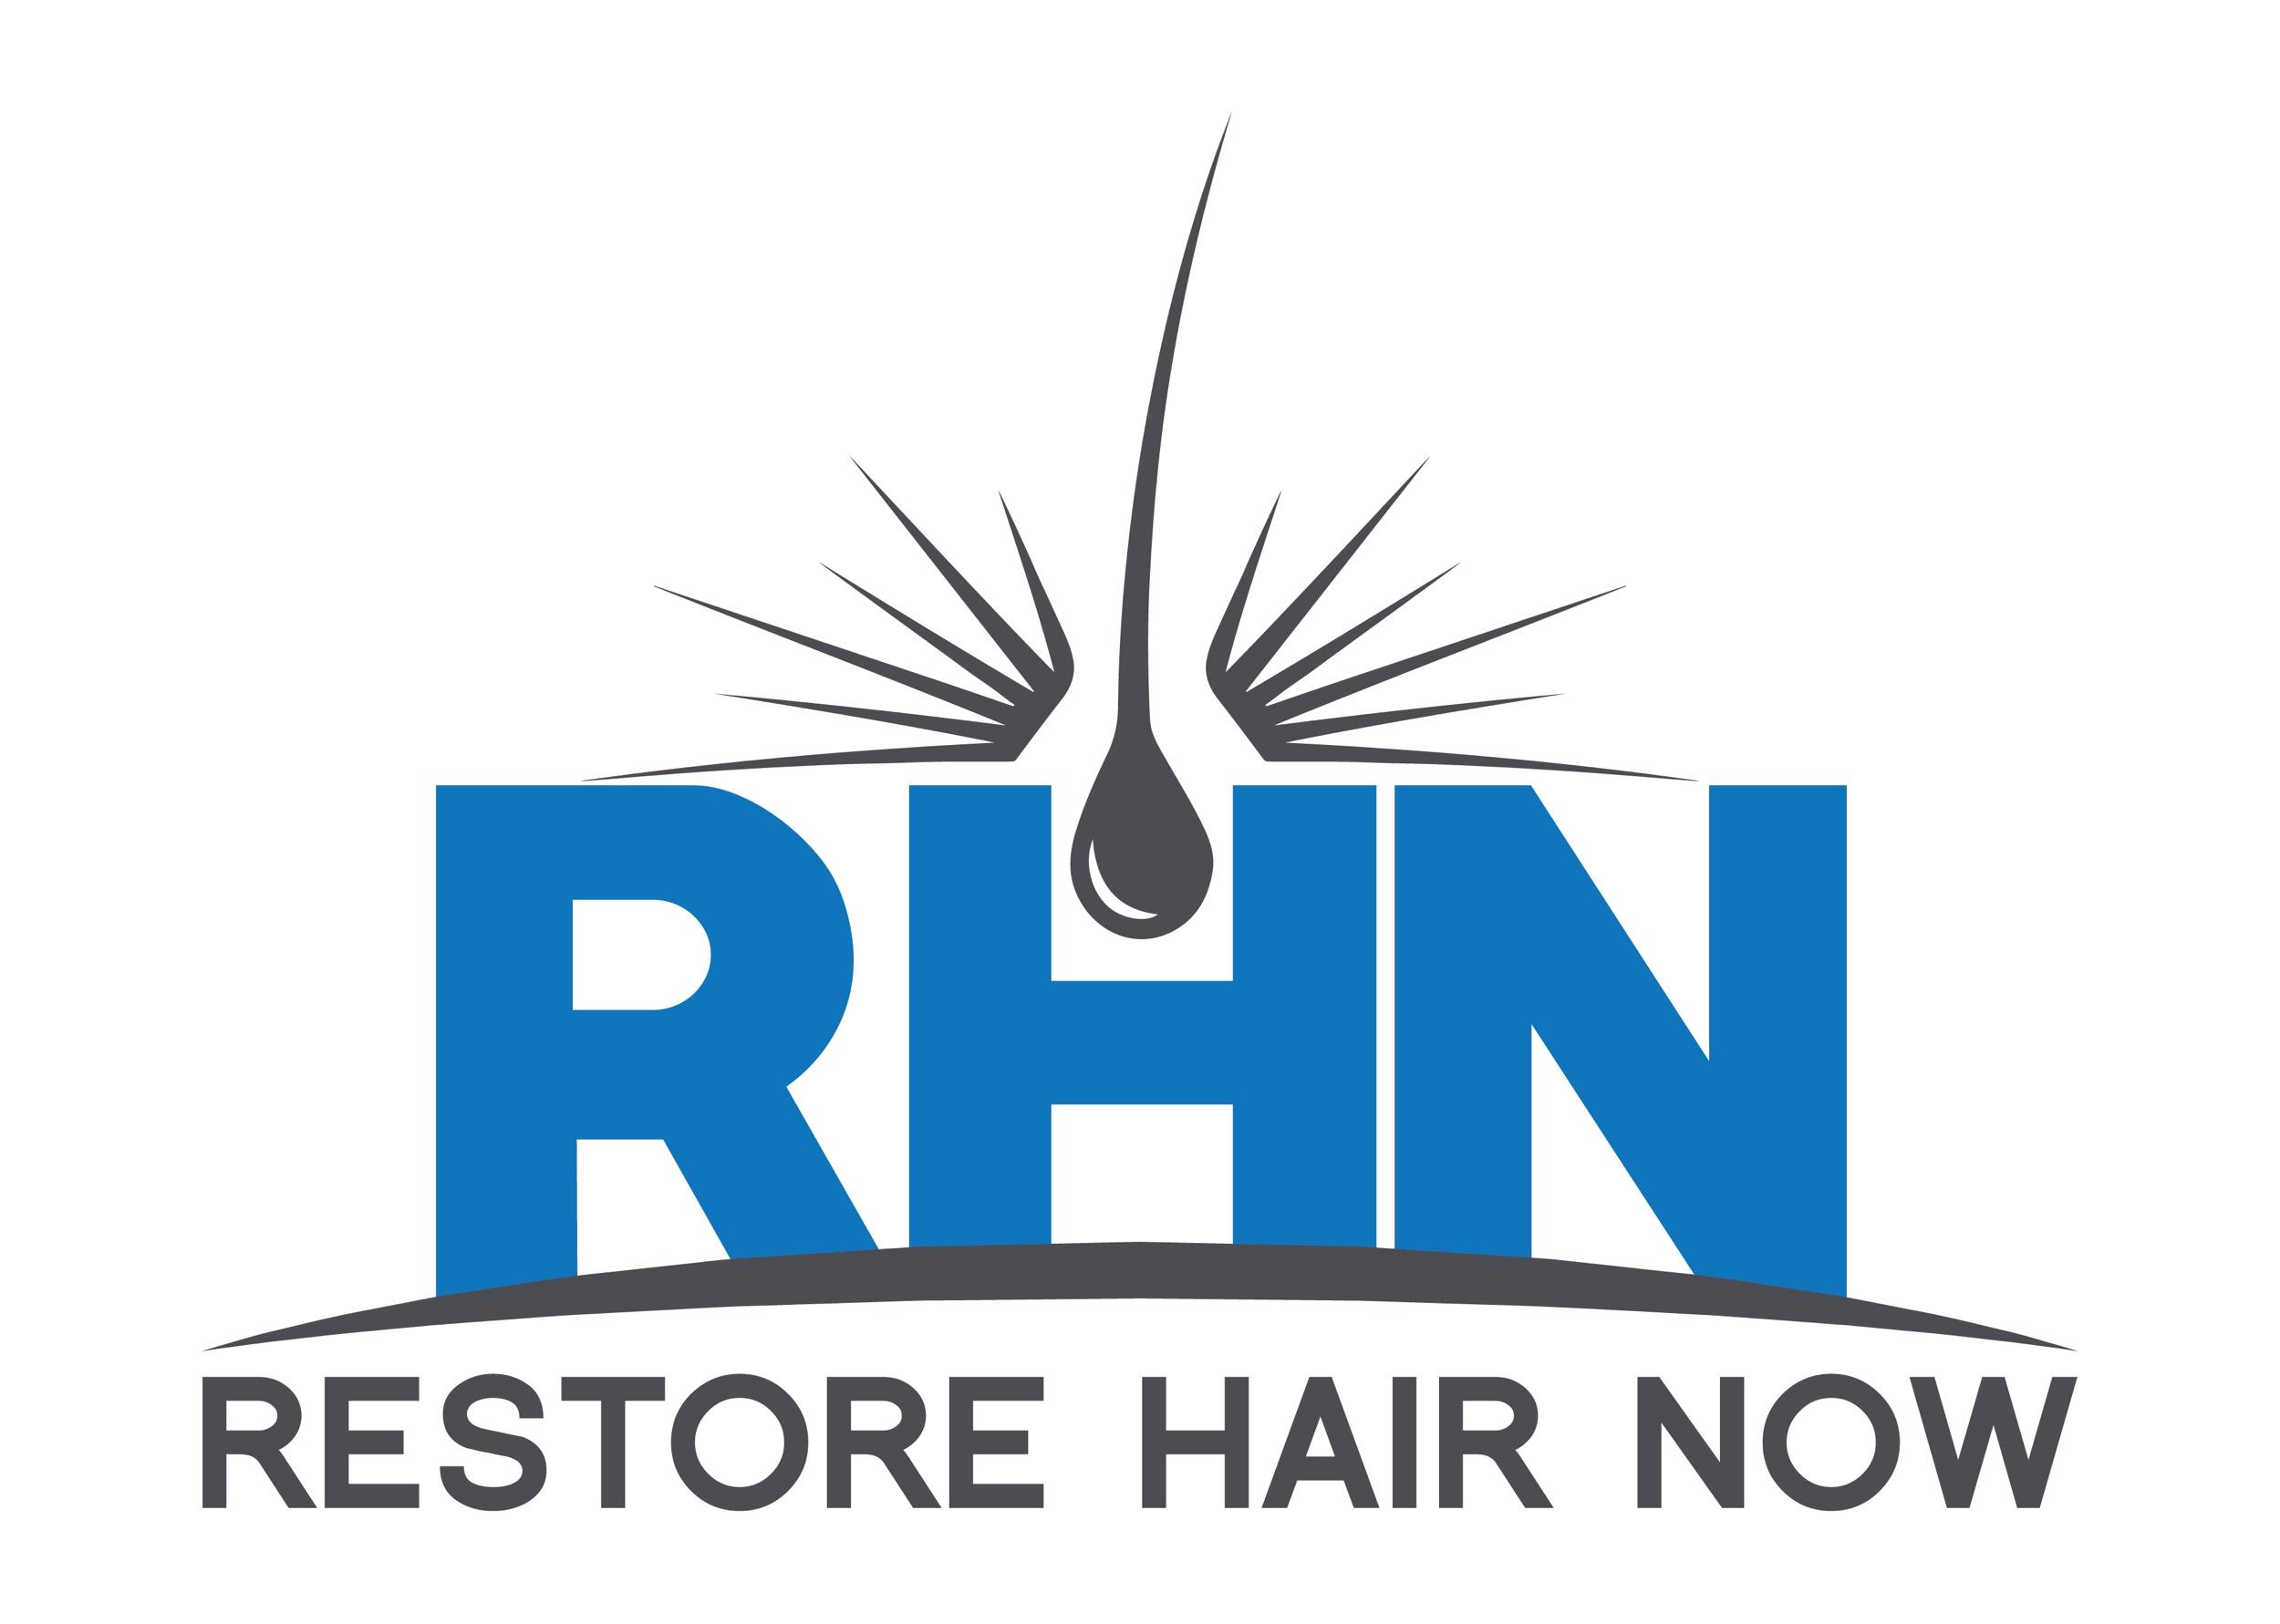 Restore hair now-01.jpeg